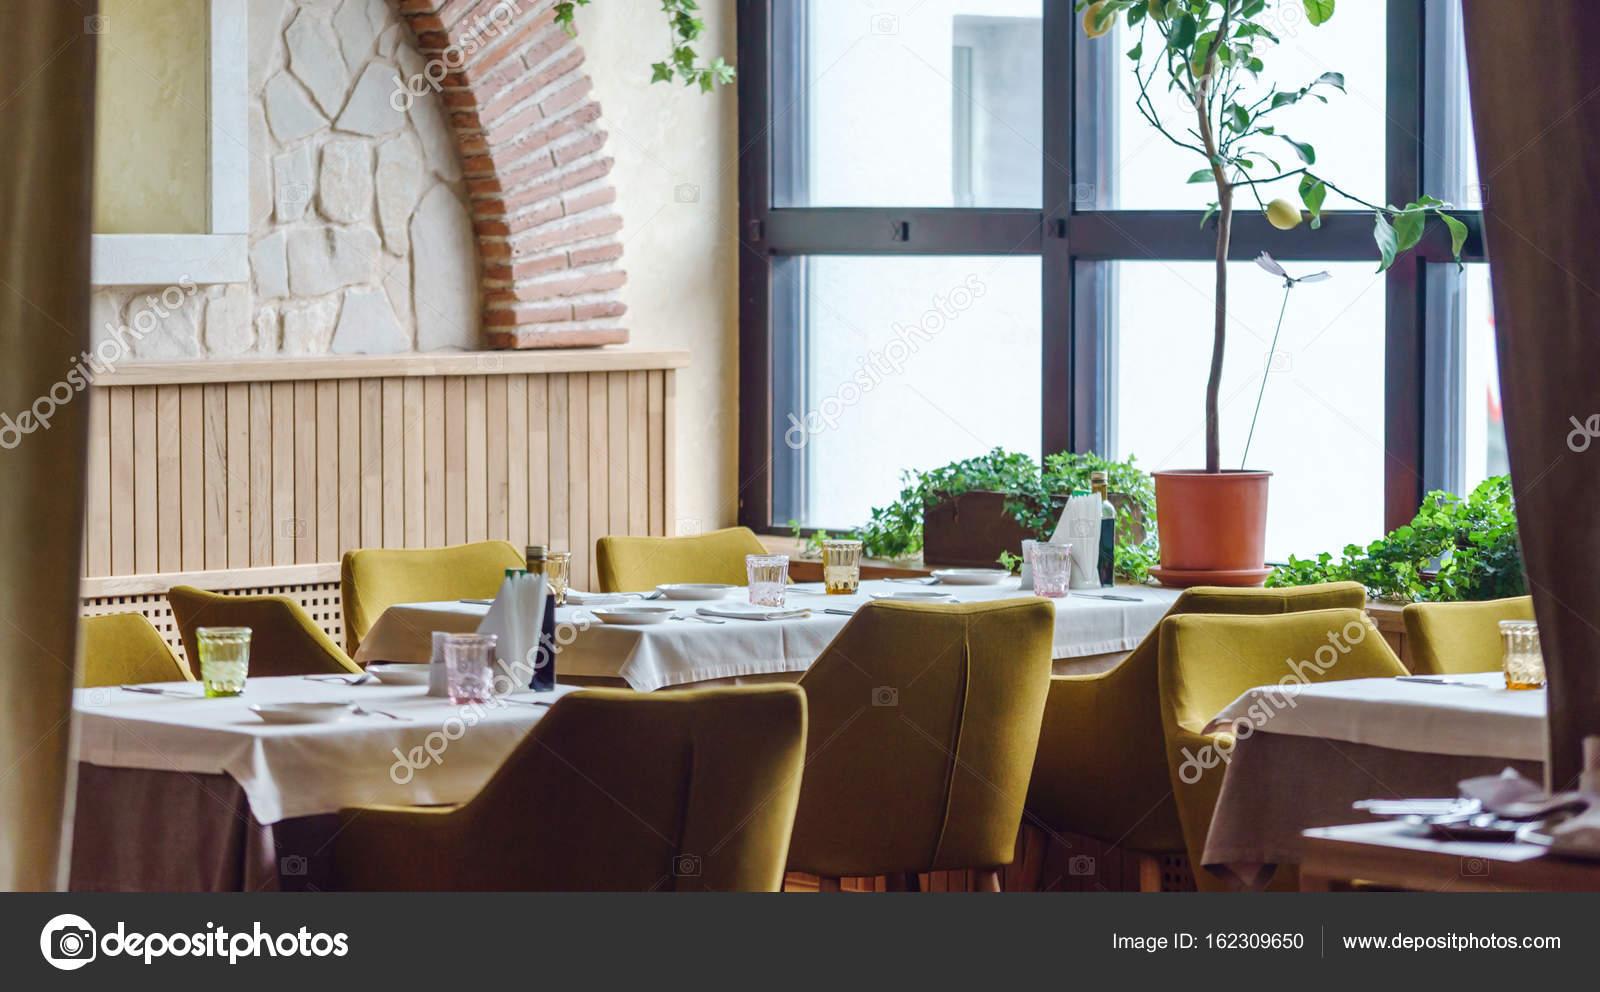 https://st3.depositphotos.com/1000336/16230/i/1600/depositphotos_162309650-stockafbeelding-interieur-van-italiaans-restaurant.jpg